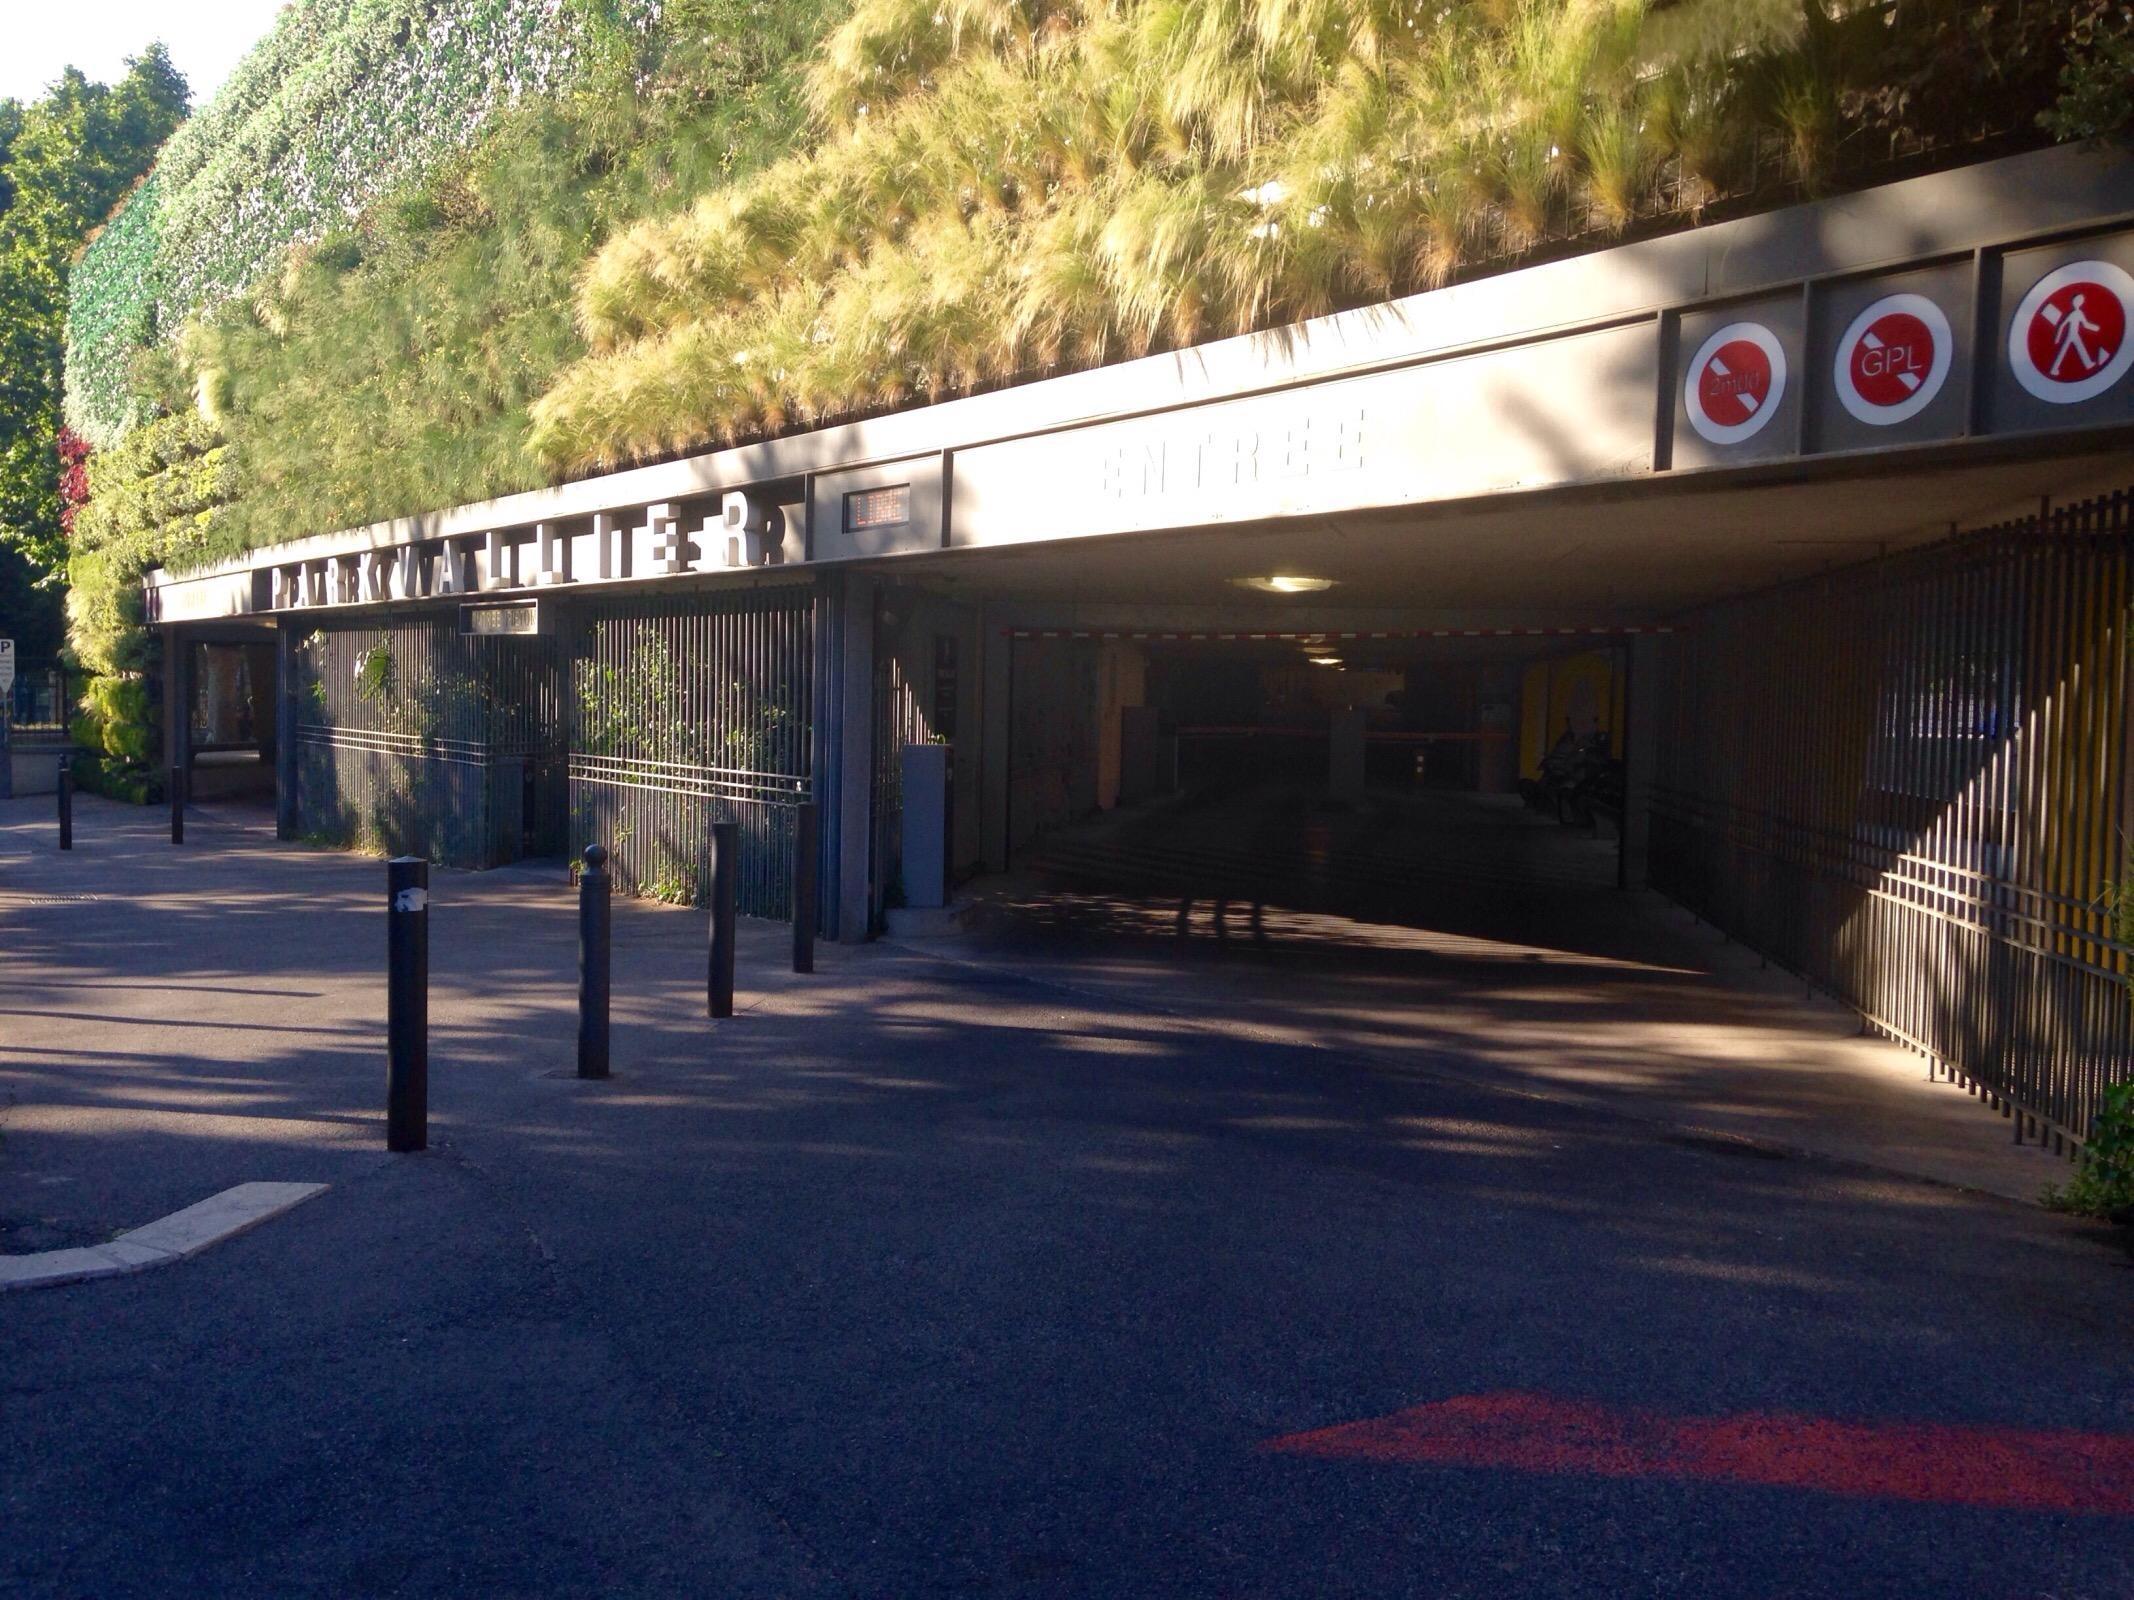 Vallier parking in marseille parkme for E parking marseille